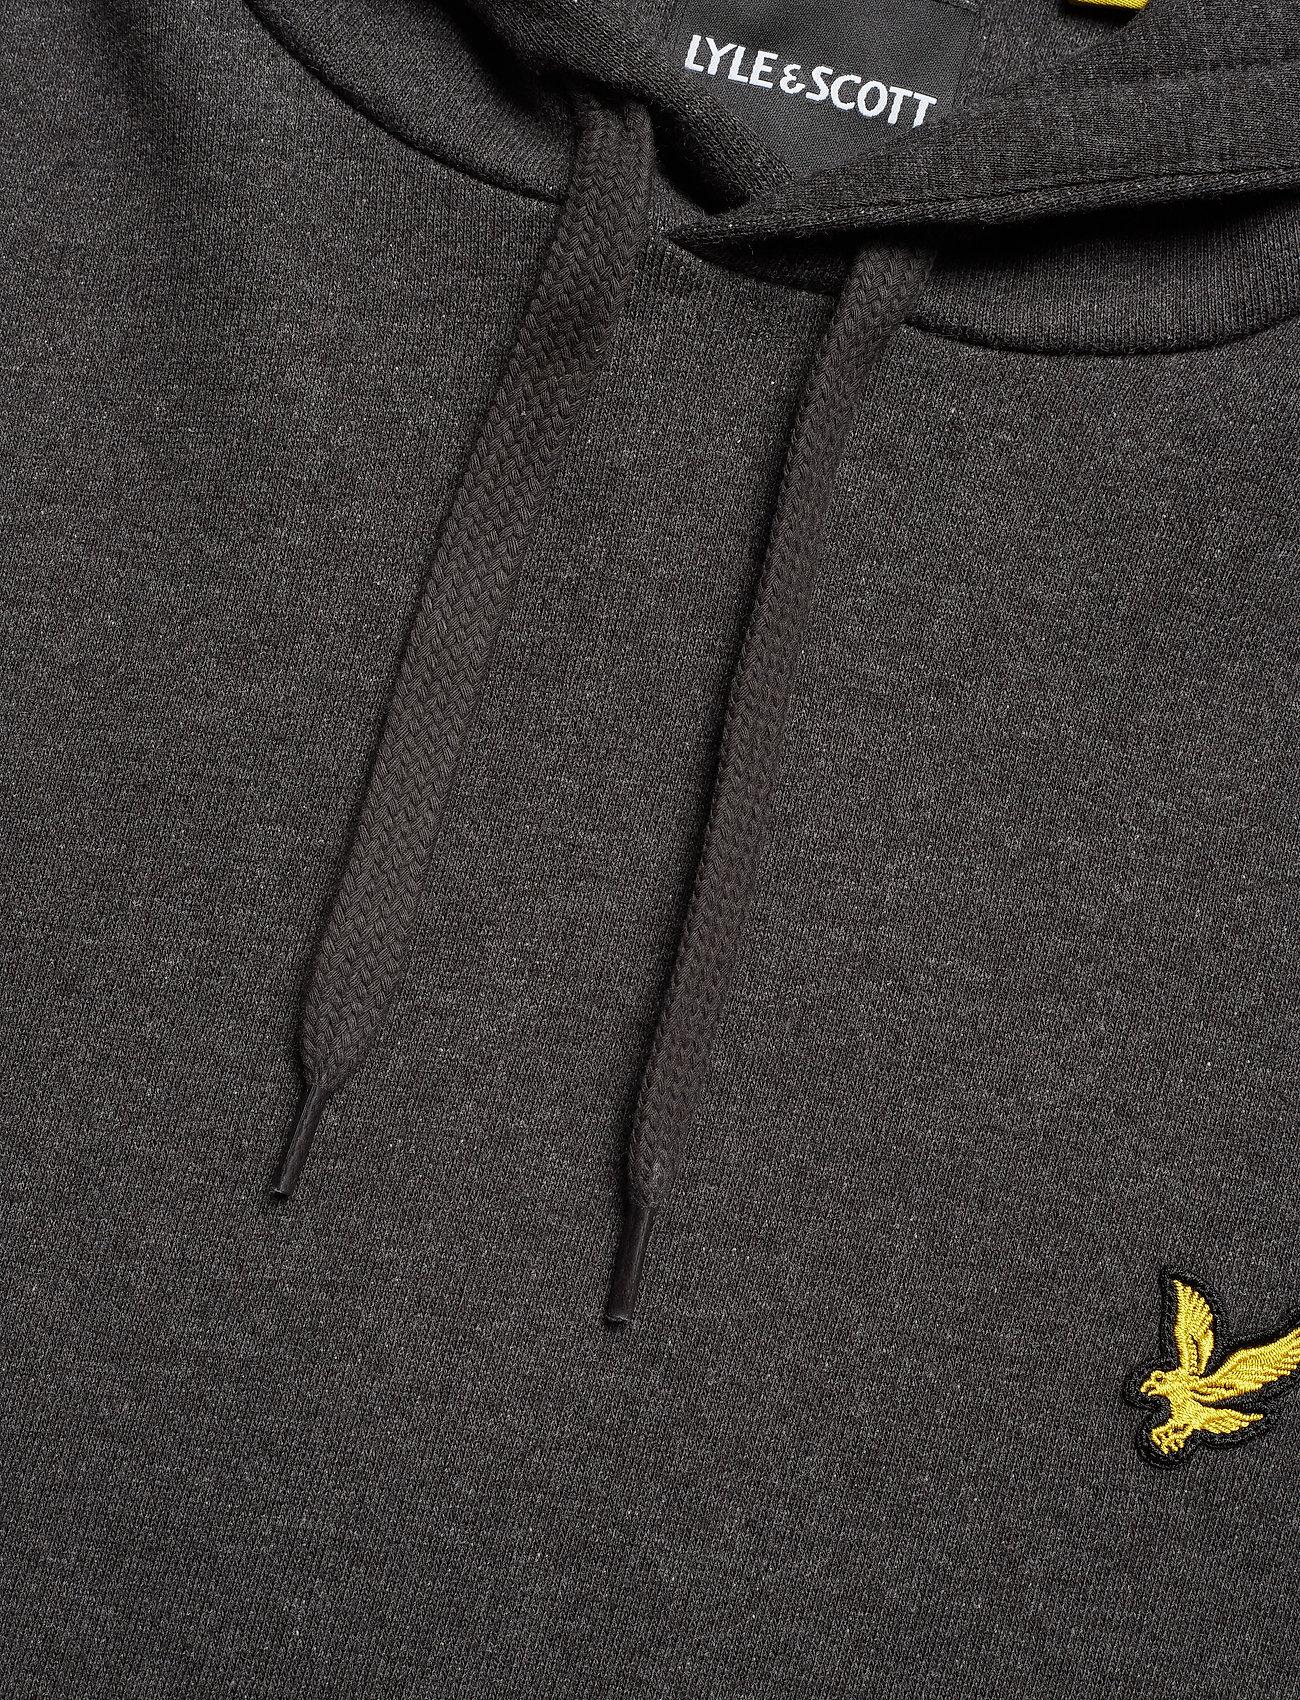 Lyle & Scott Pullover Hoodie - Sweatshirts CHARCOAL MARL - Menn Klær